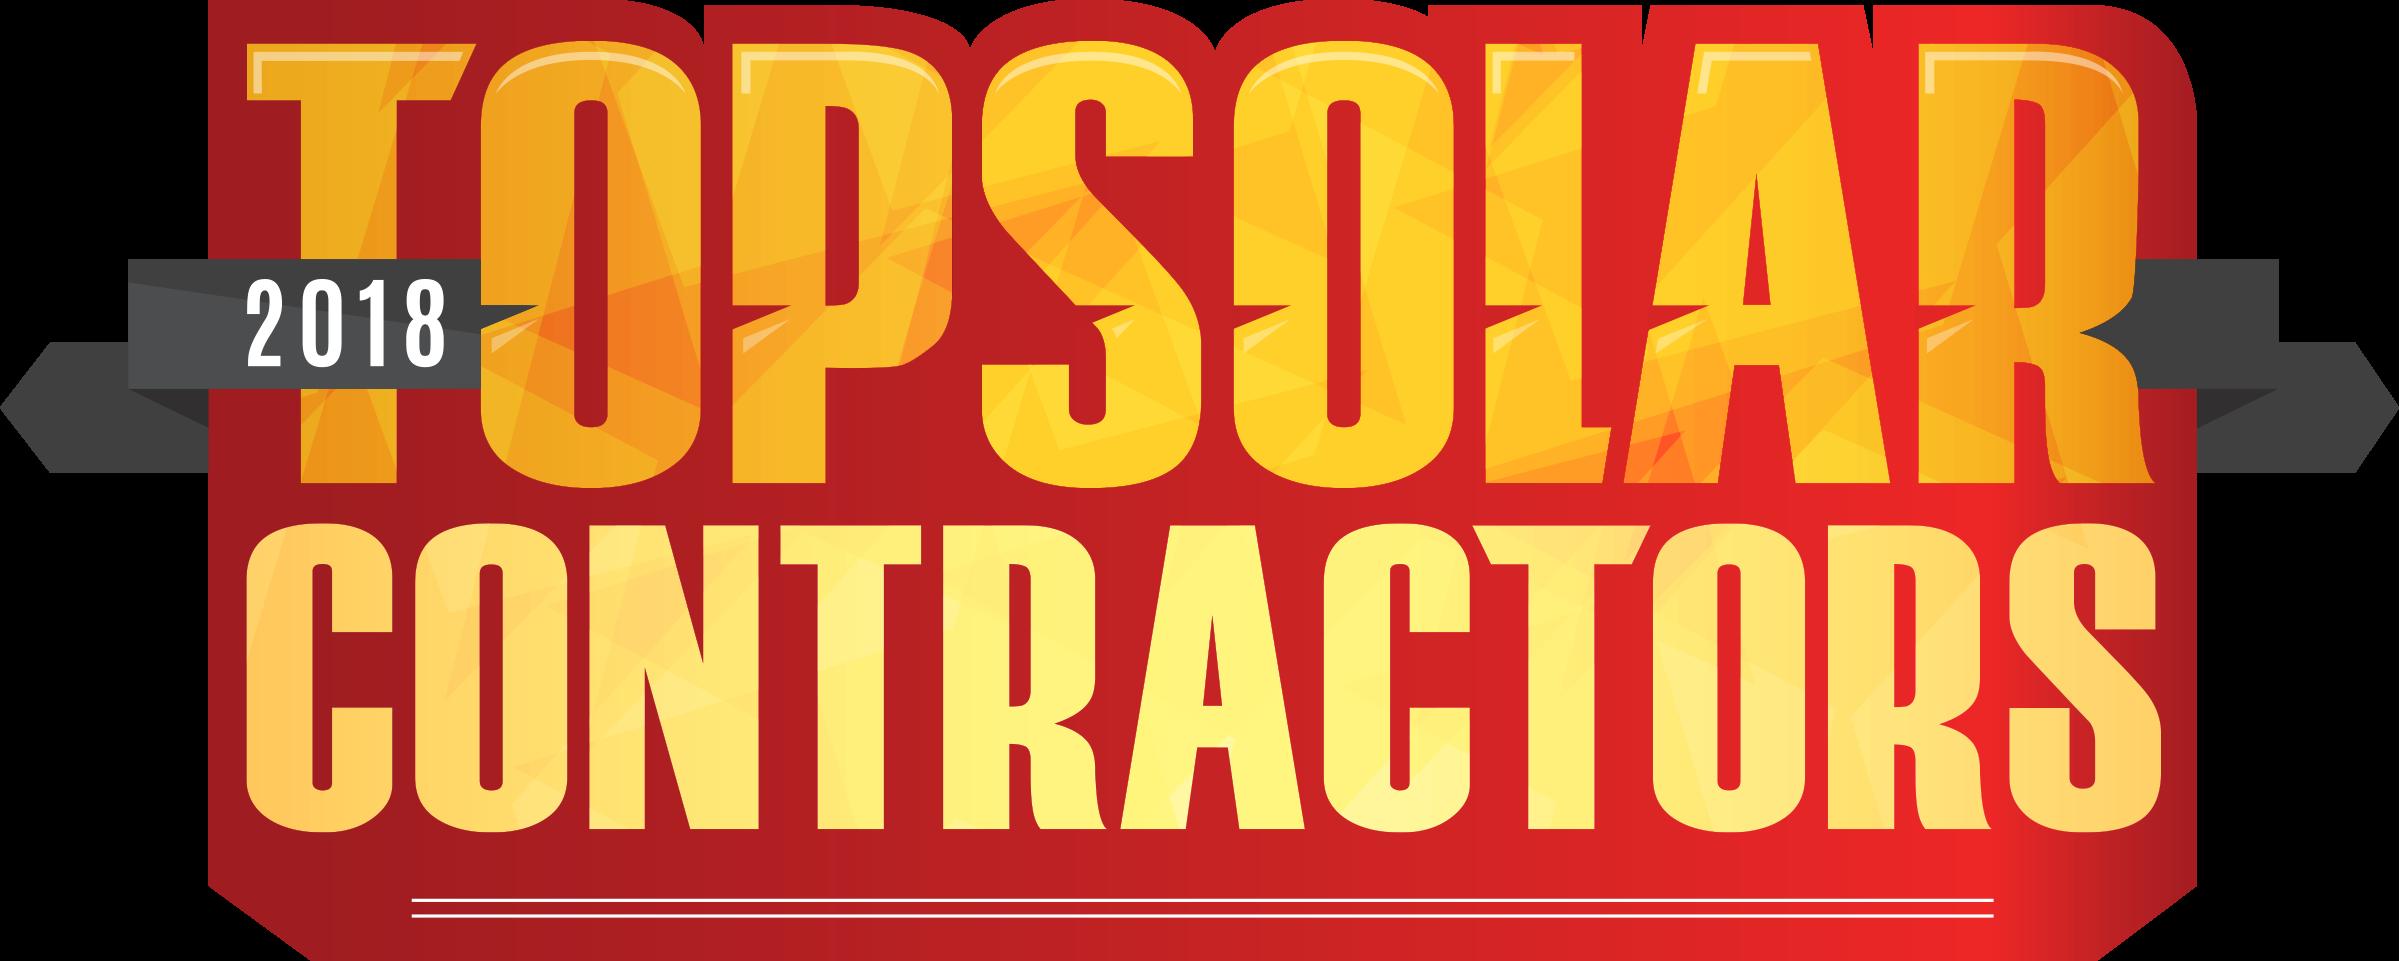 2018 Top Solar Contractor Solar Power World